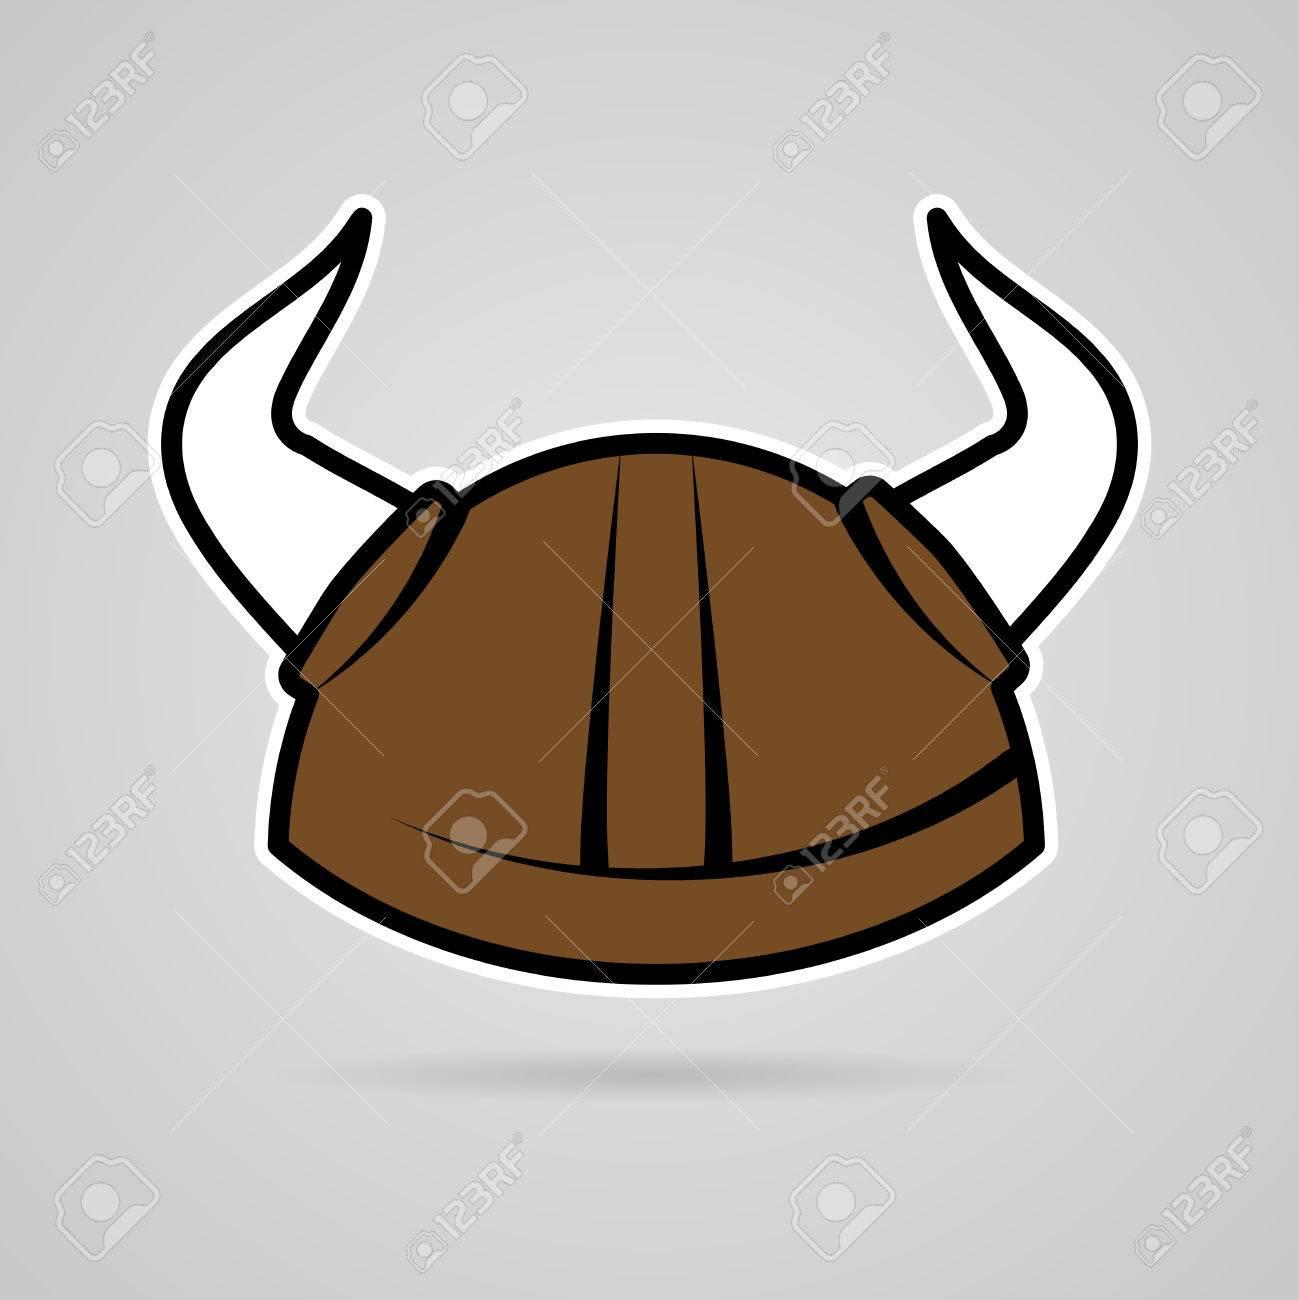 1299x1300 Clean Simple Vector Viking Helmet Sticker Royalty Free Cliparts